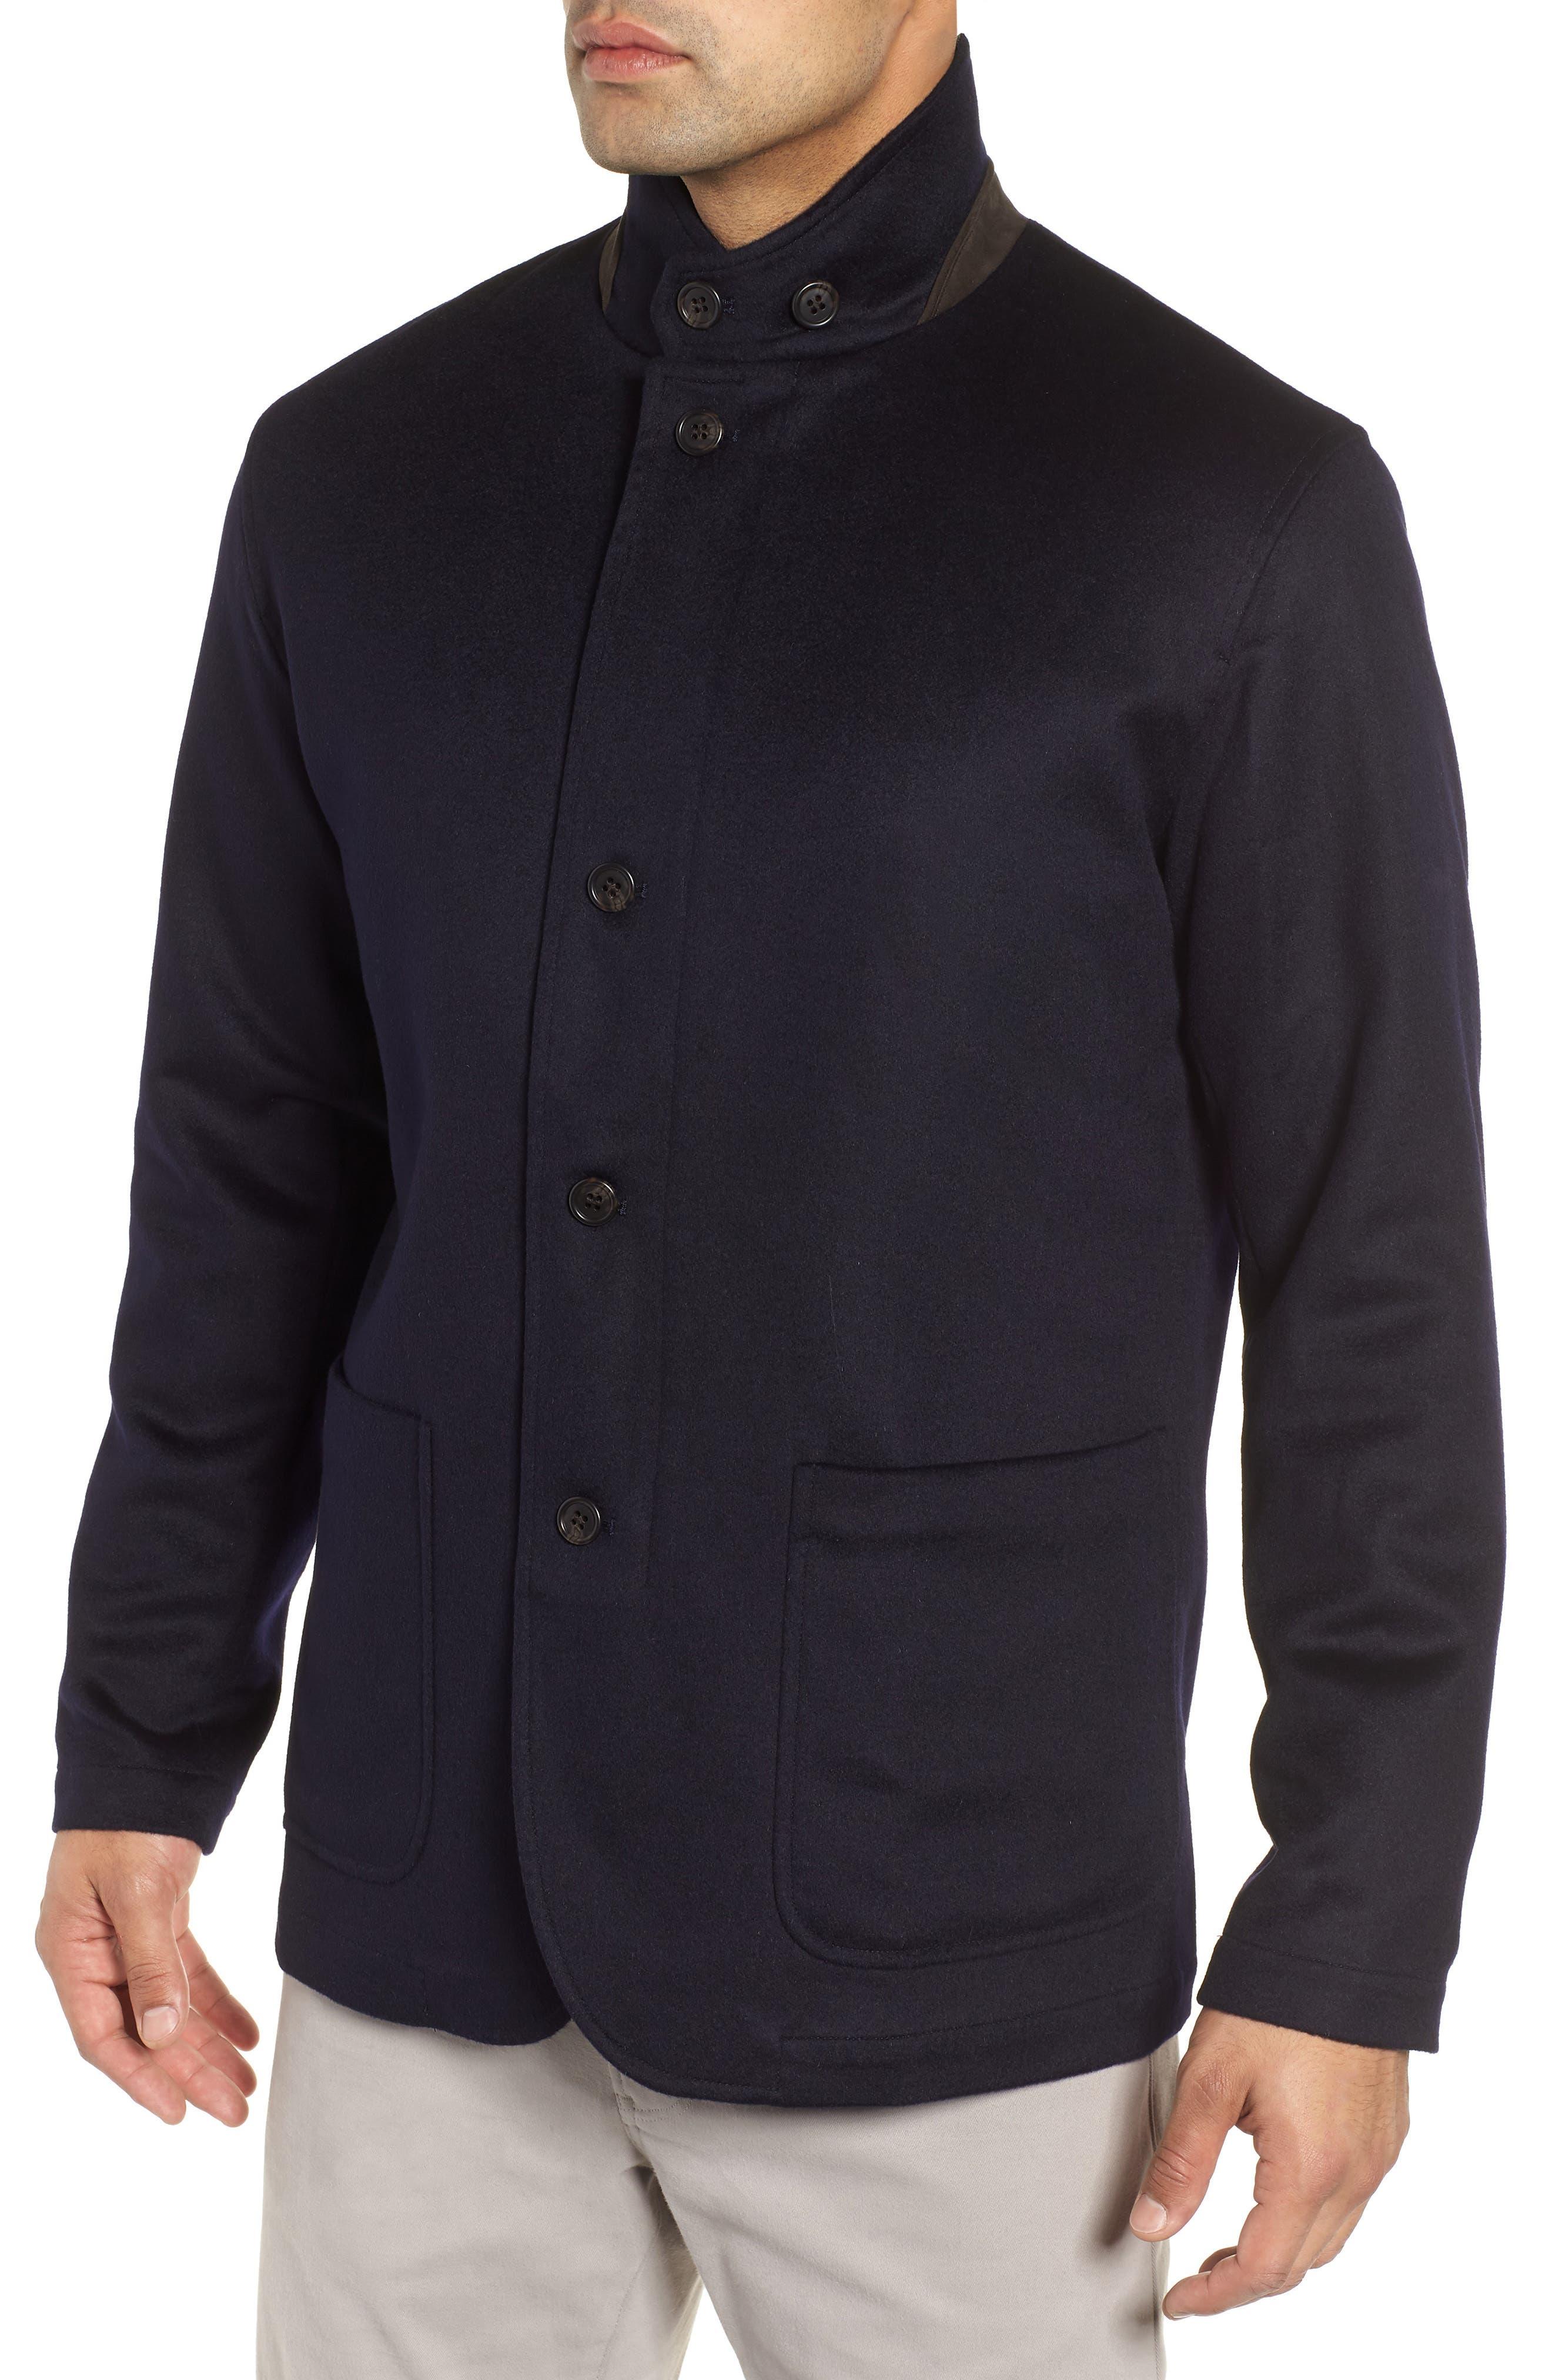 Wade Crown Fleece Jacket,                             Alternate thumbnail 4, color,                             ARCTIC NIGHT